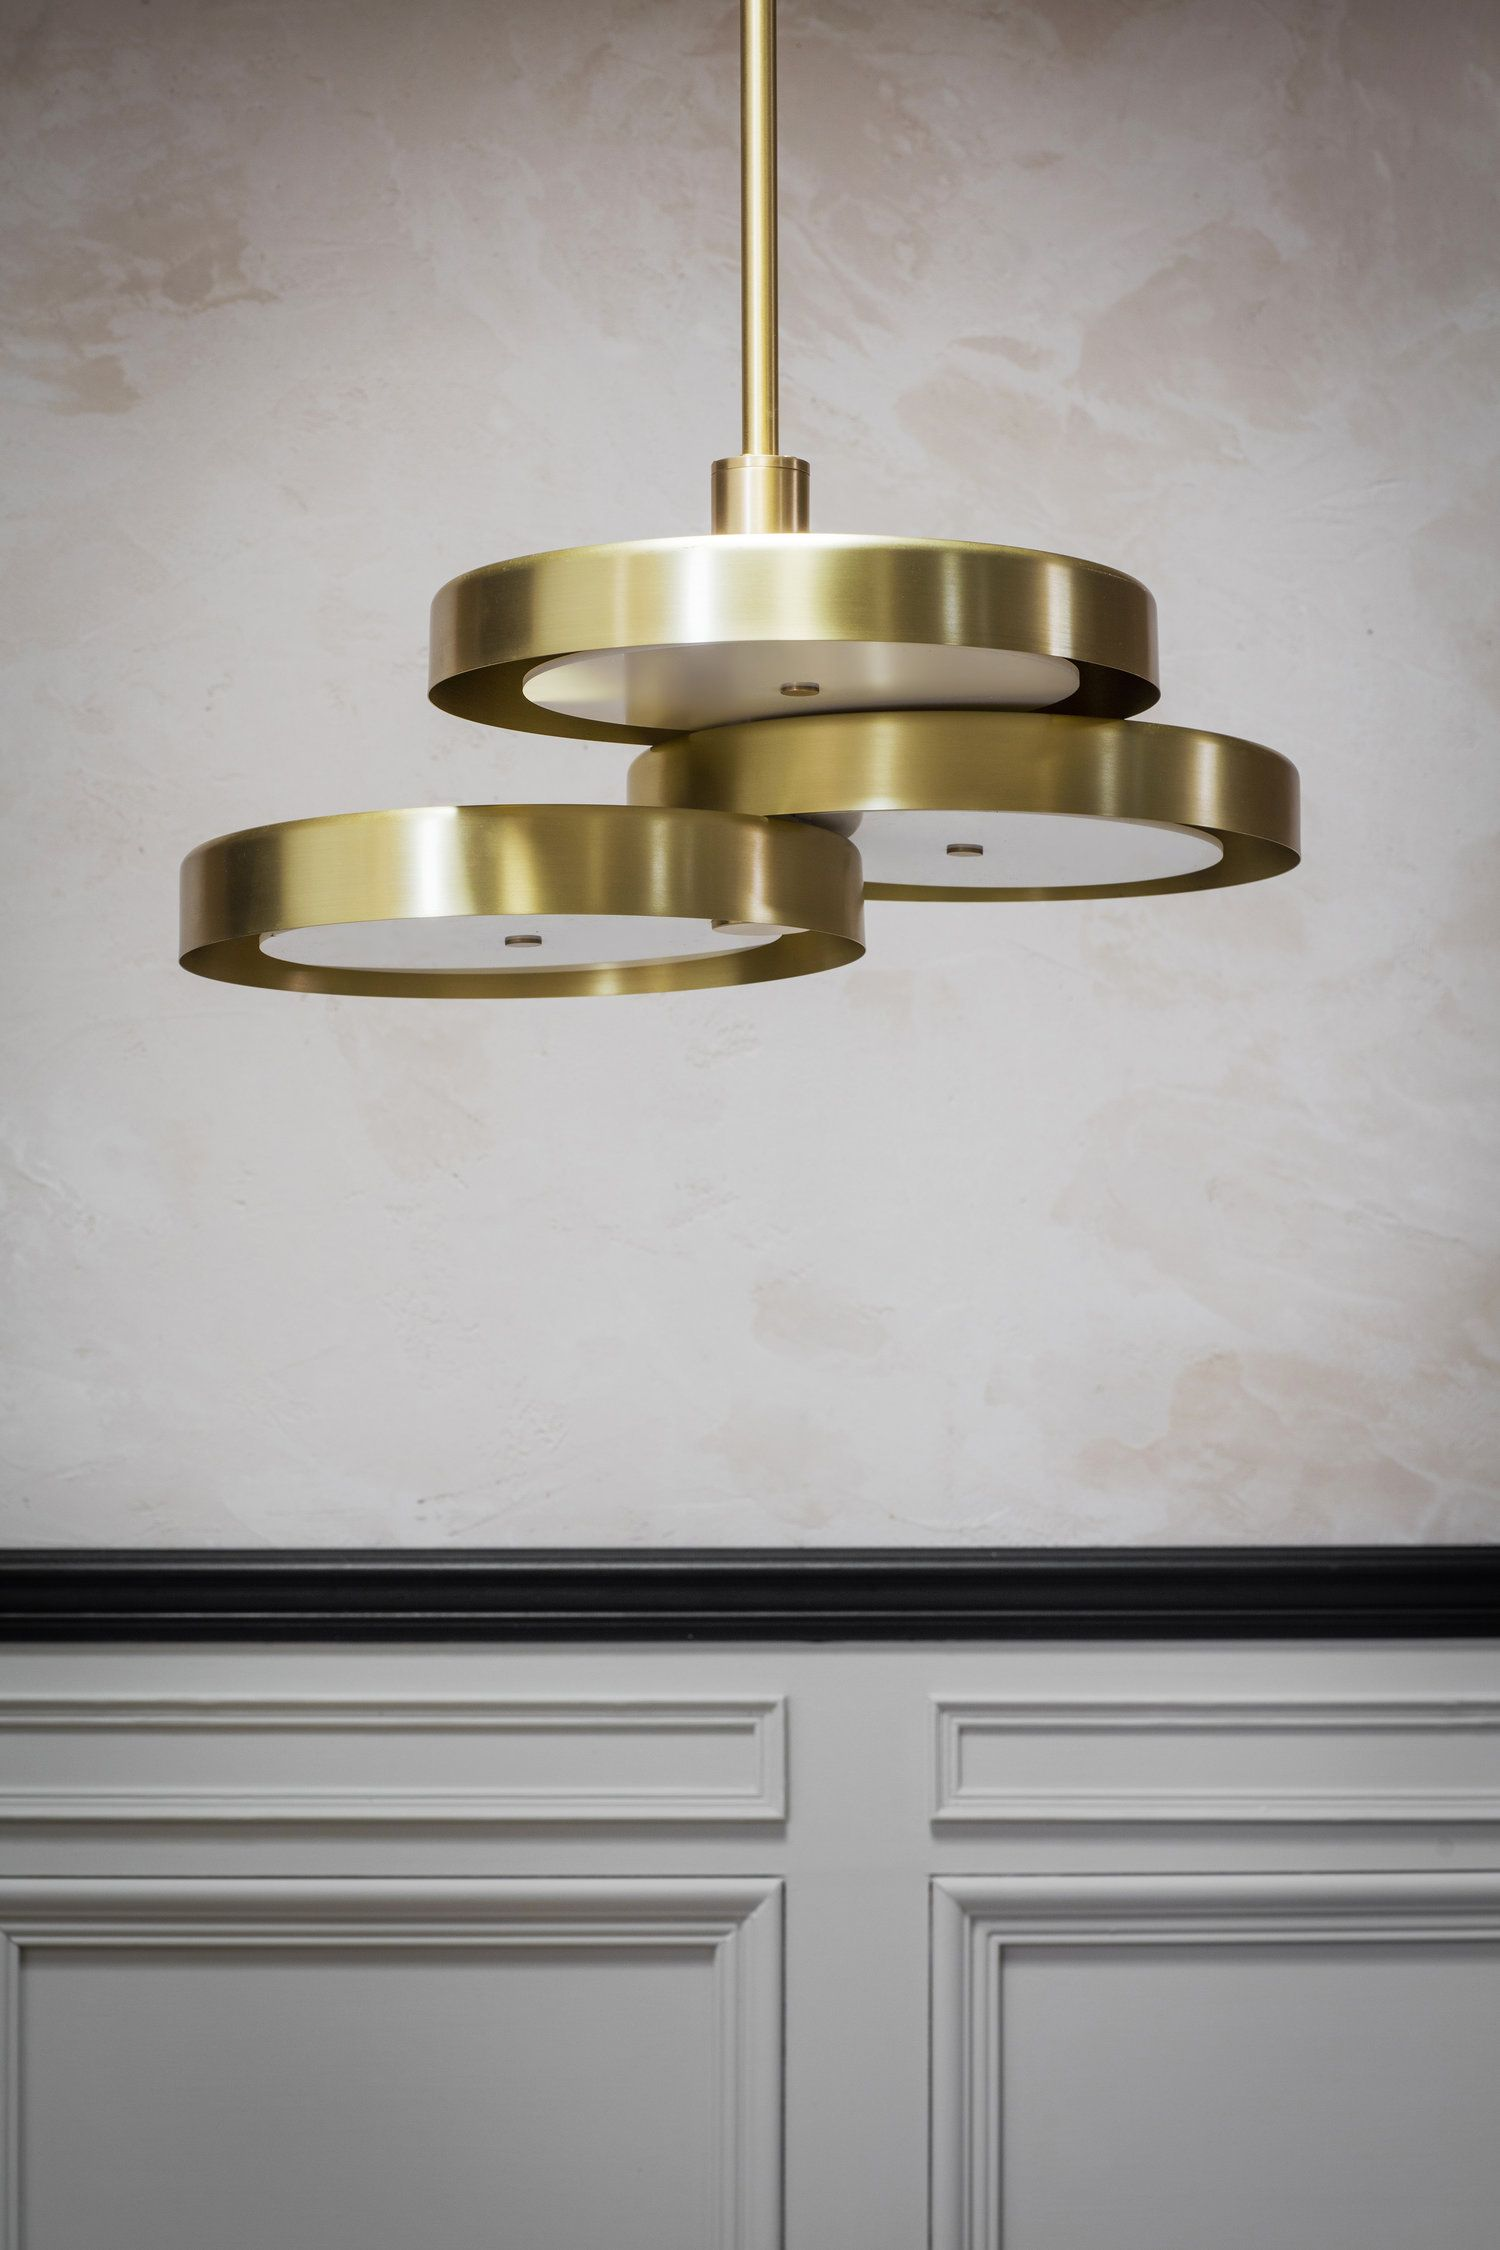 Bert frank triarc chandelier g lamps pinterest chandeliers